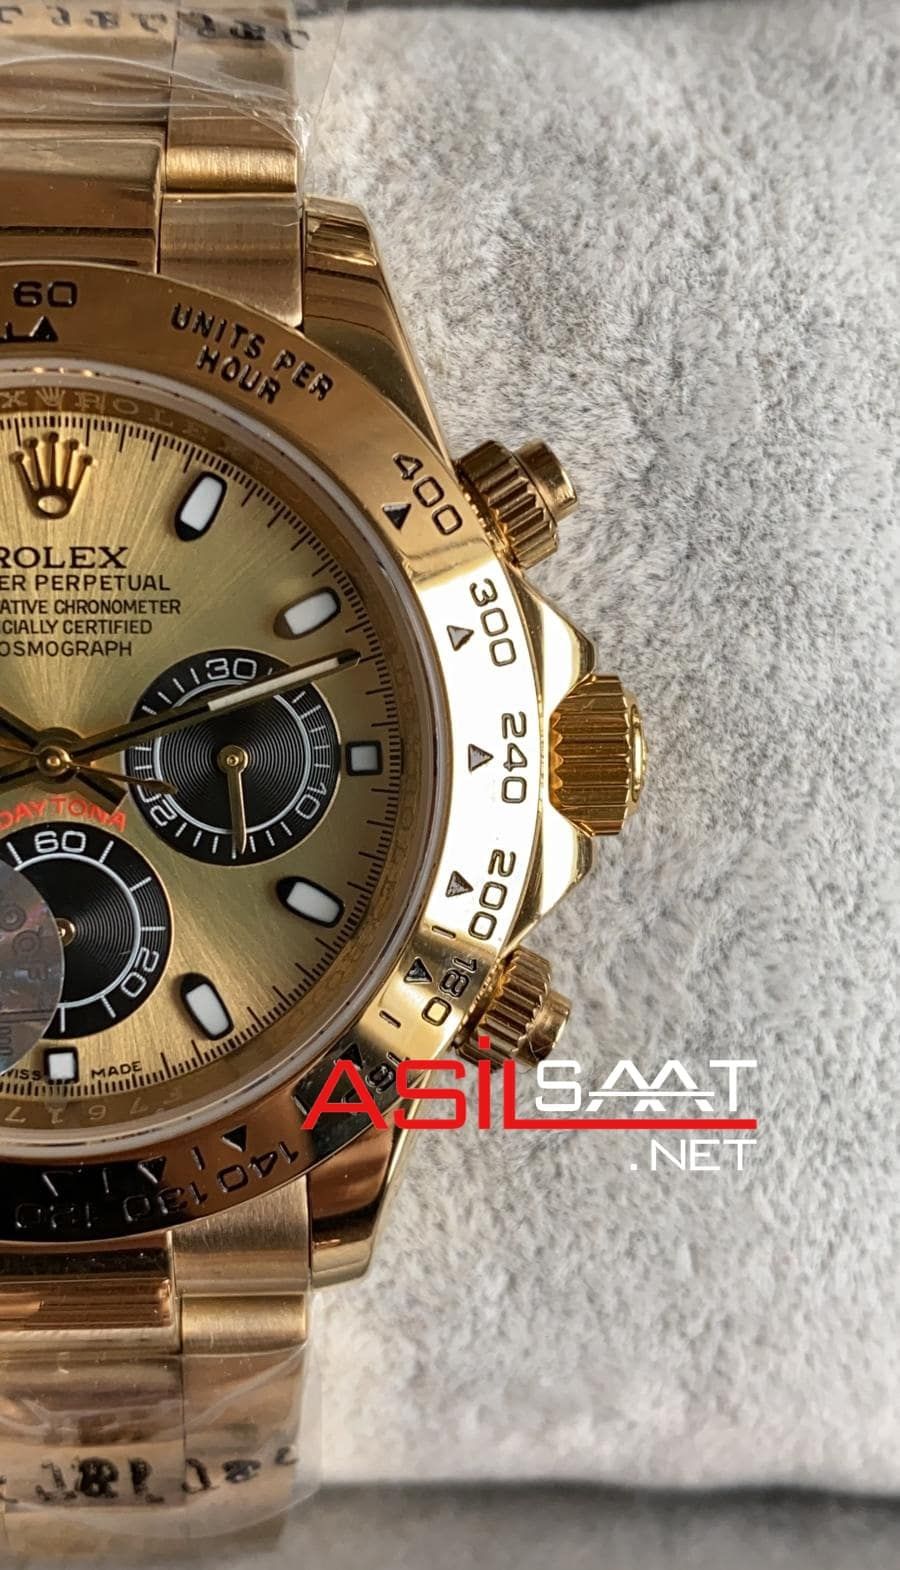 Rolex Oyster Perpetual Cosmograph Daytona Gold Replika Saat ROLDA020